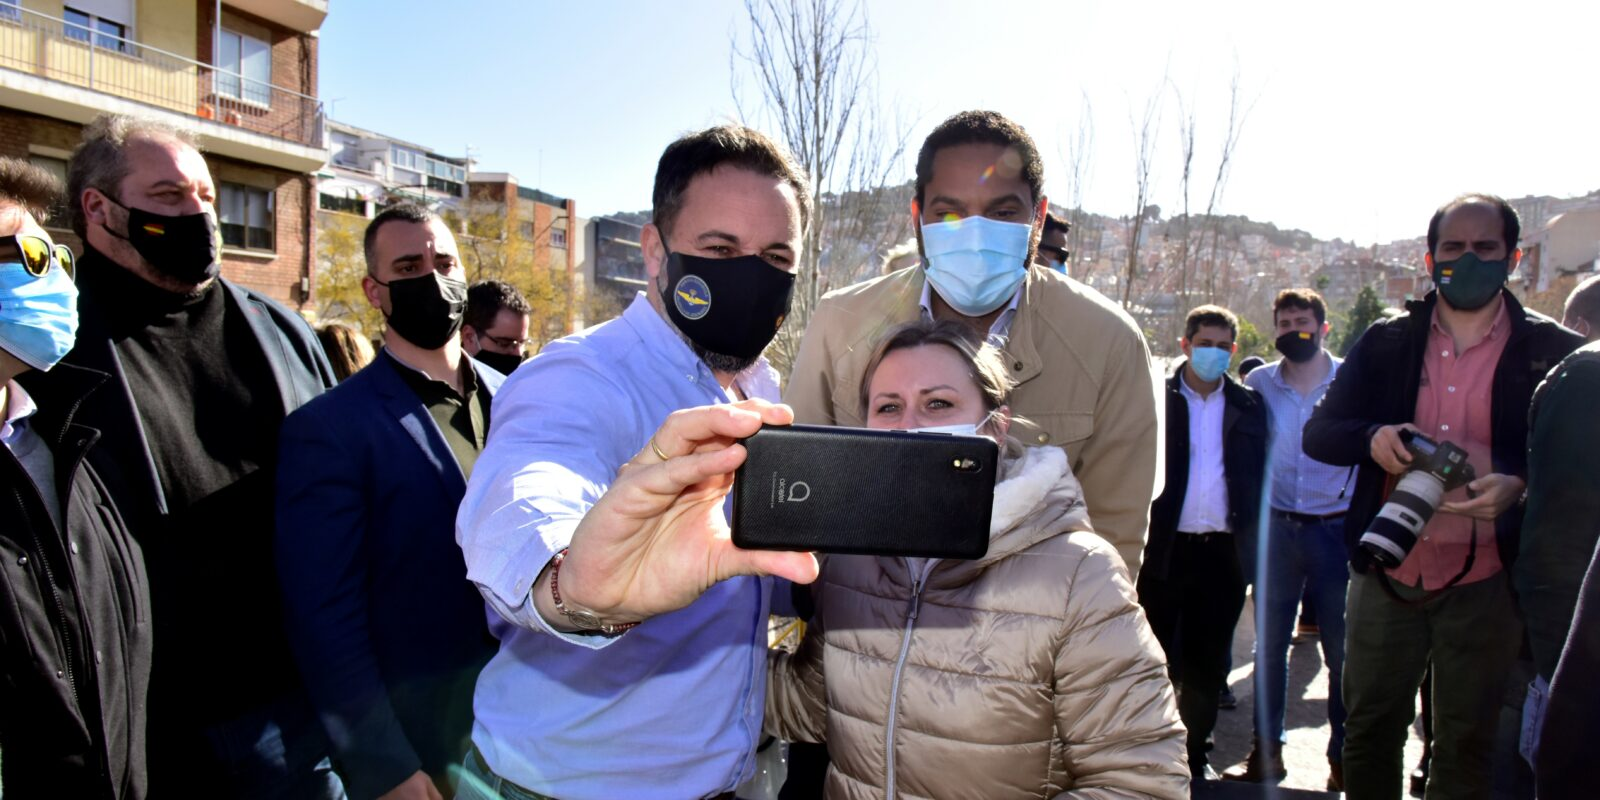 Santiago Abascal i Ignacio Garriga, fent-se un 'selfie' en campanya a Barcelona / David Oller (Europa Press)